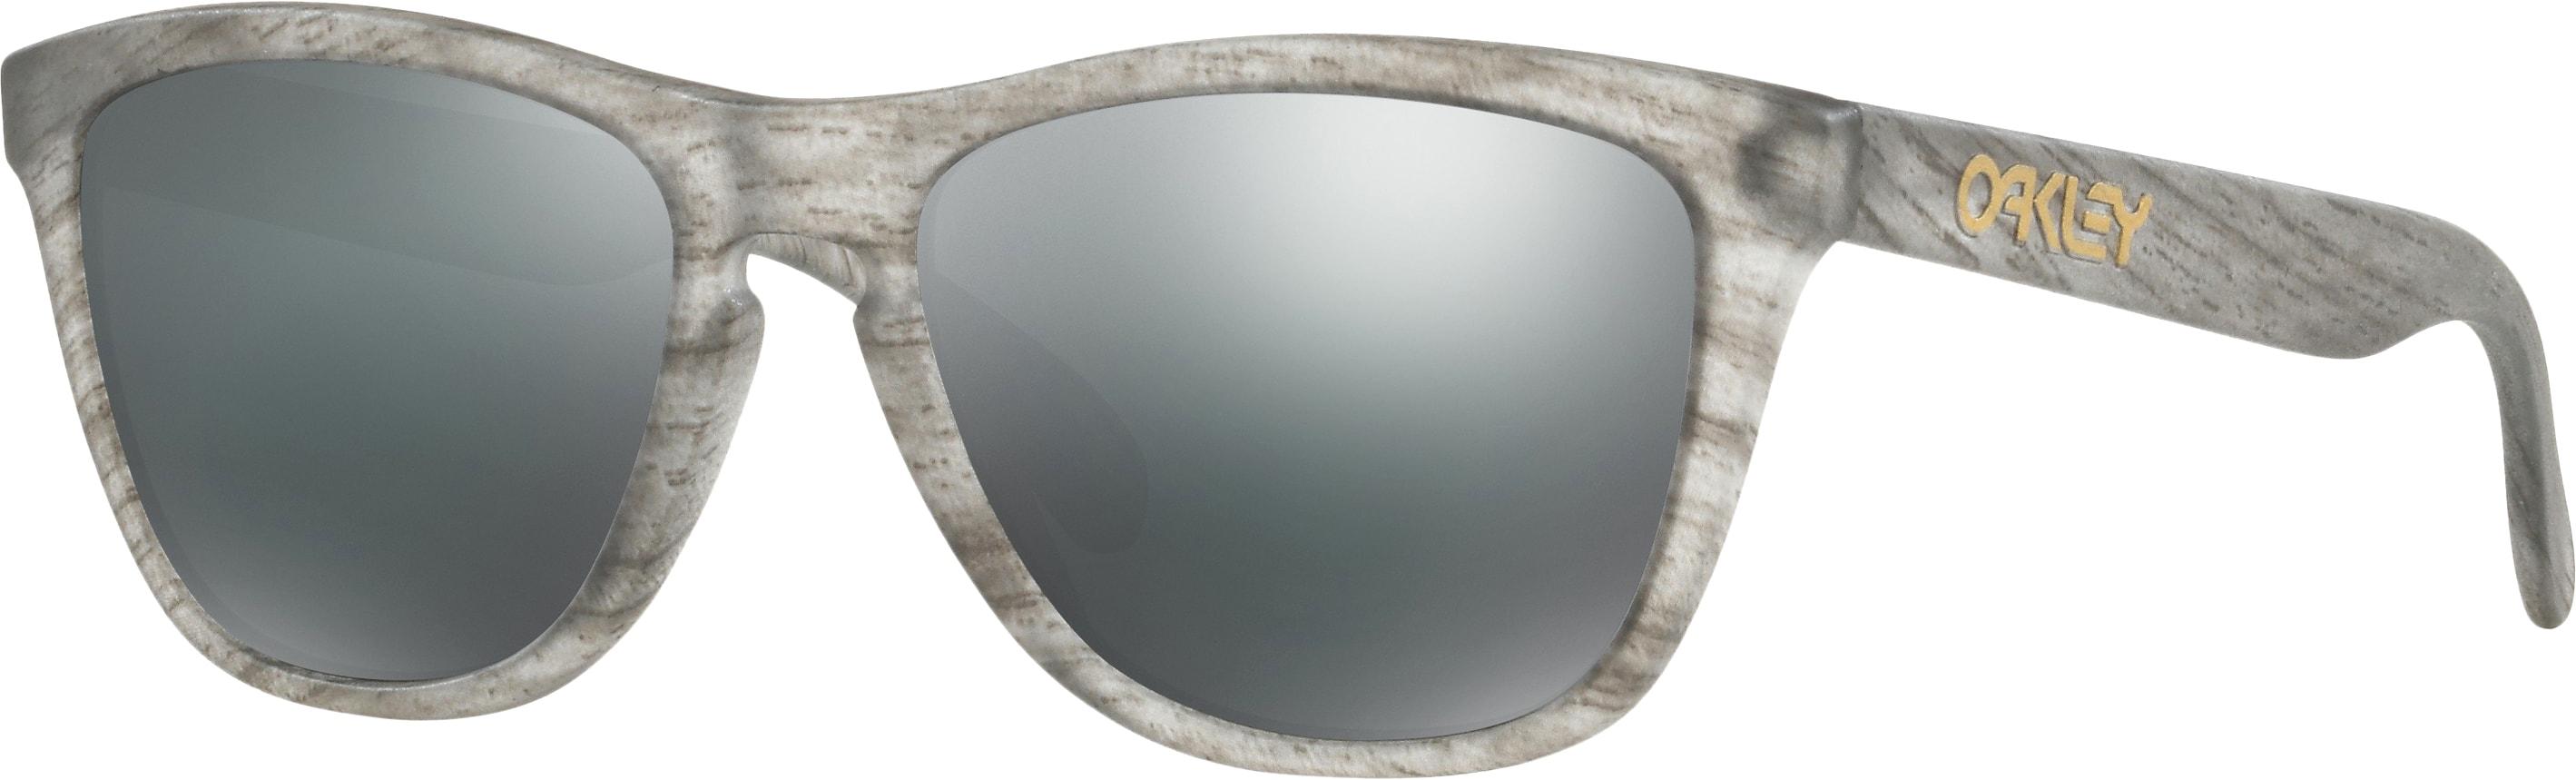 Oakley Frogskins Driftwood Collection Sunglasses oa9fsdcmcwbizz-oakley-sunglasses